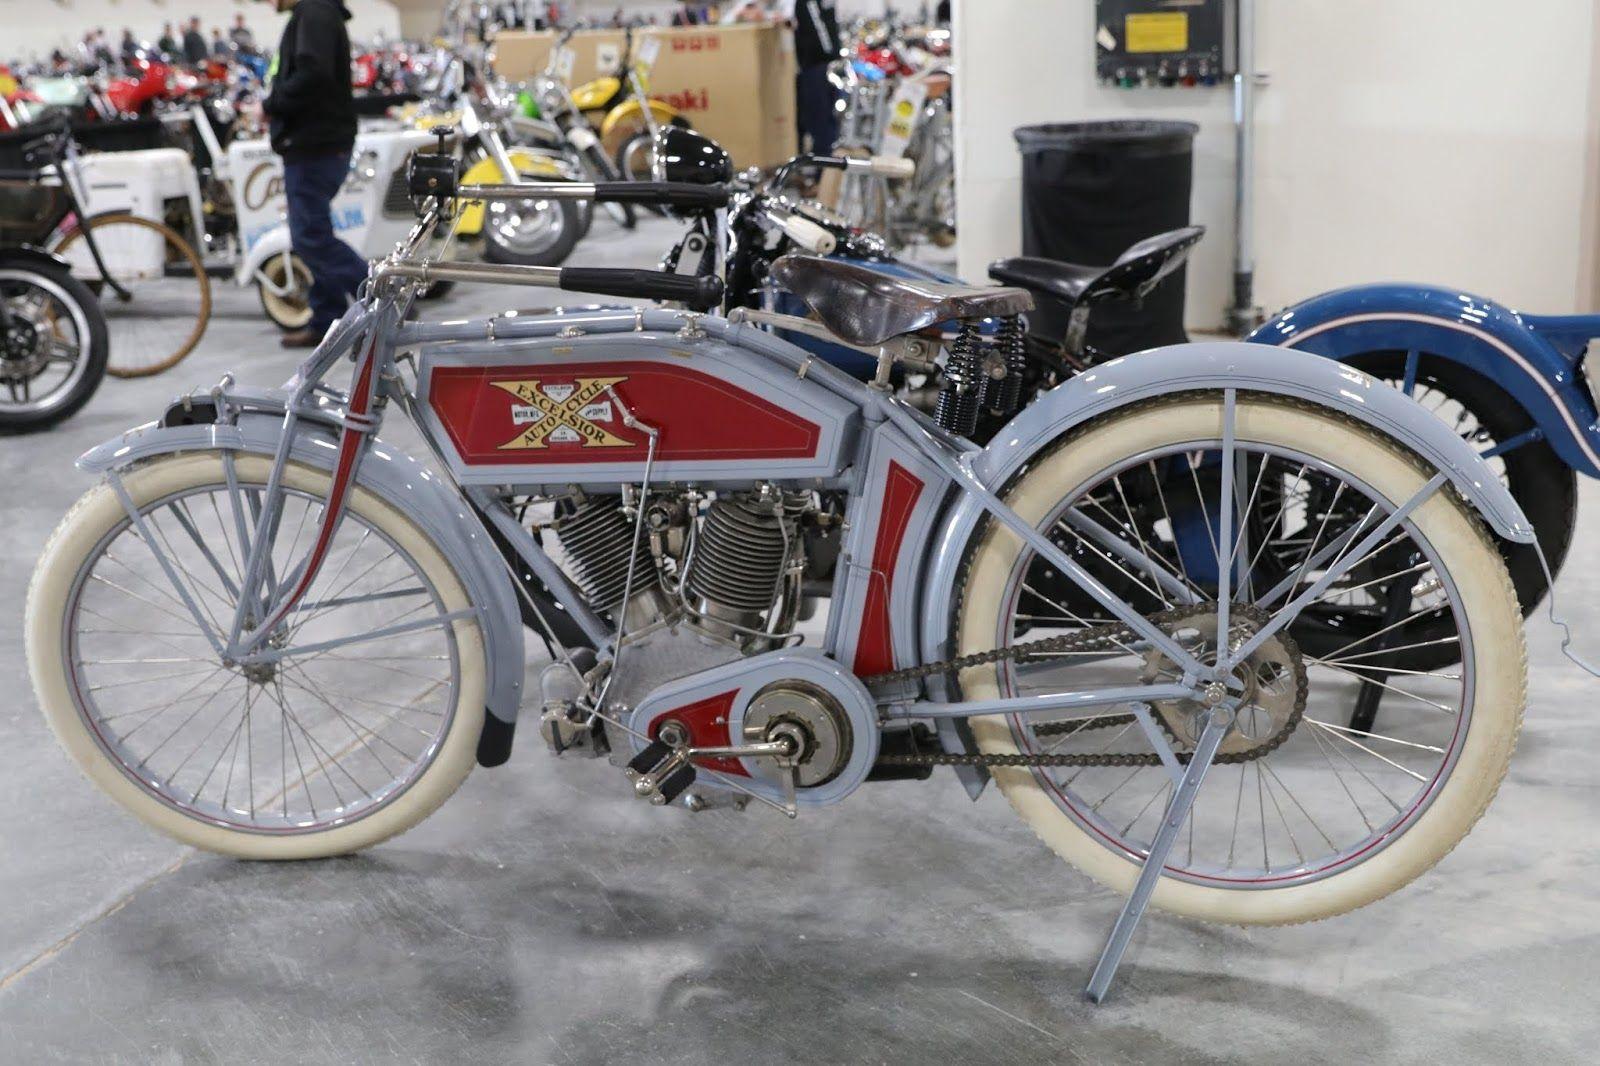 1913 Excelsior C7 V Twin Motorcycle Excelsior Vintage Motorcycles